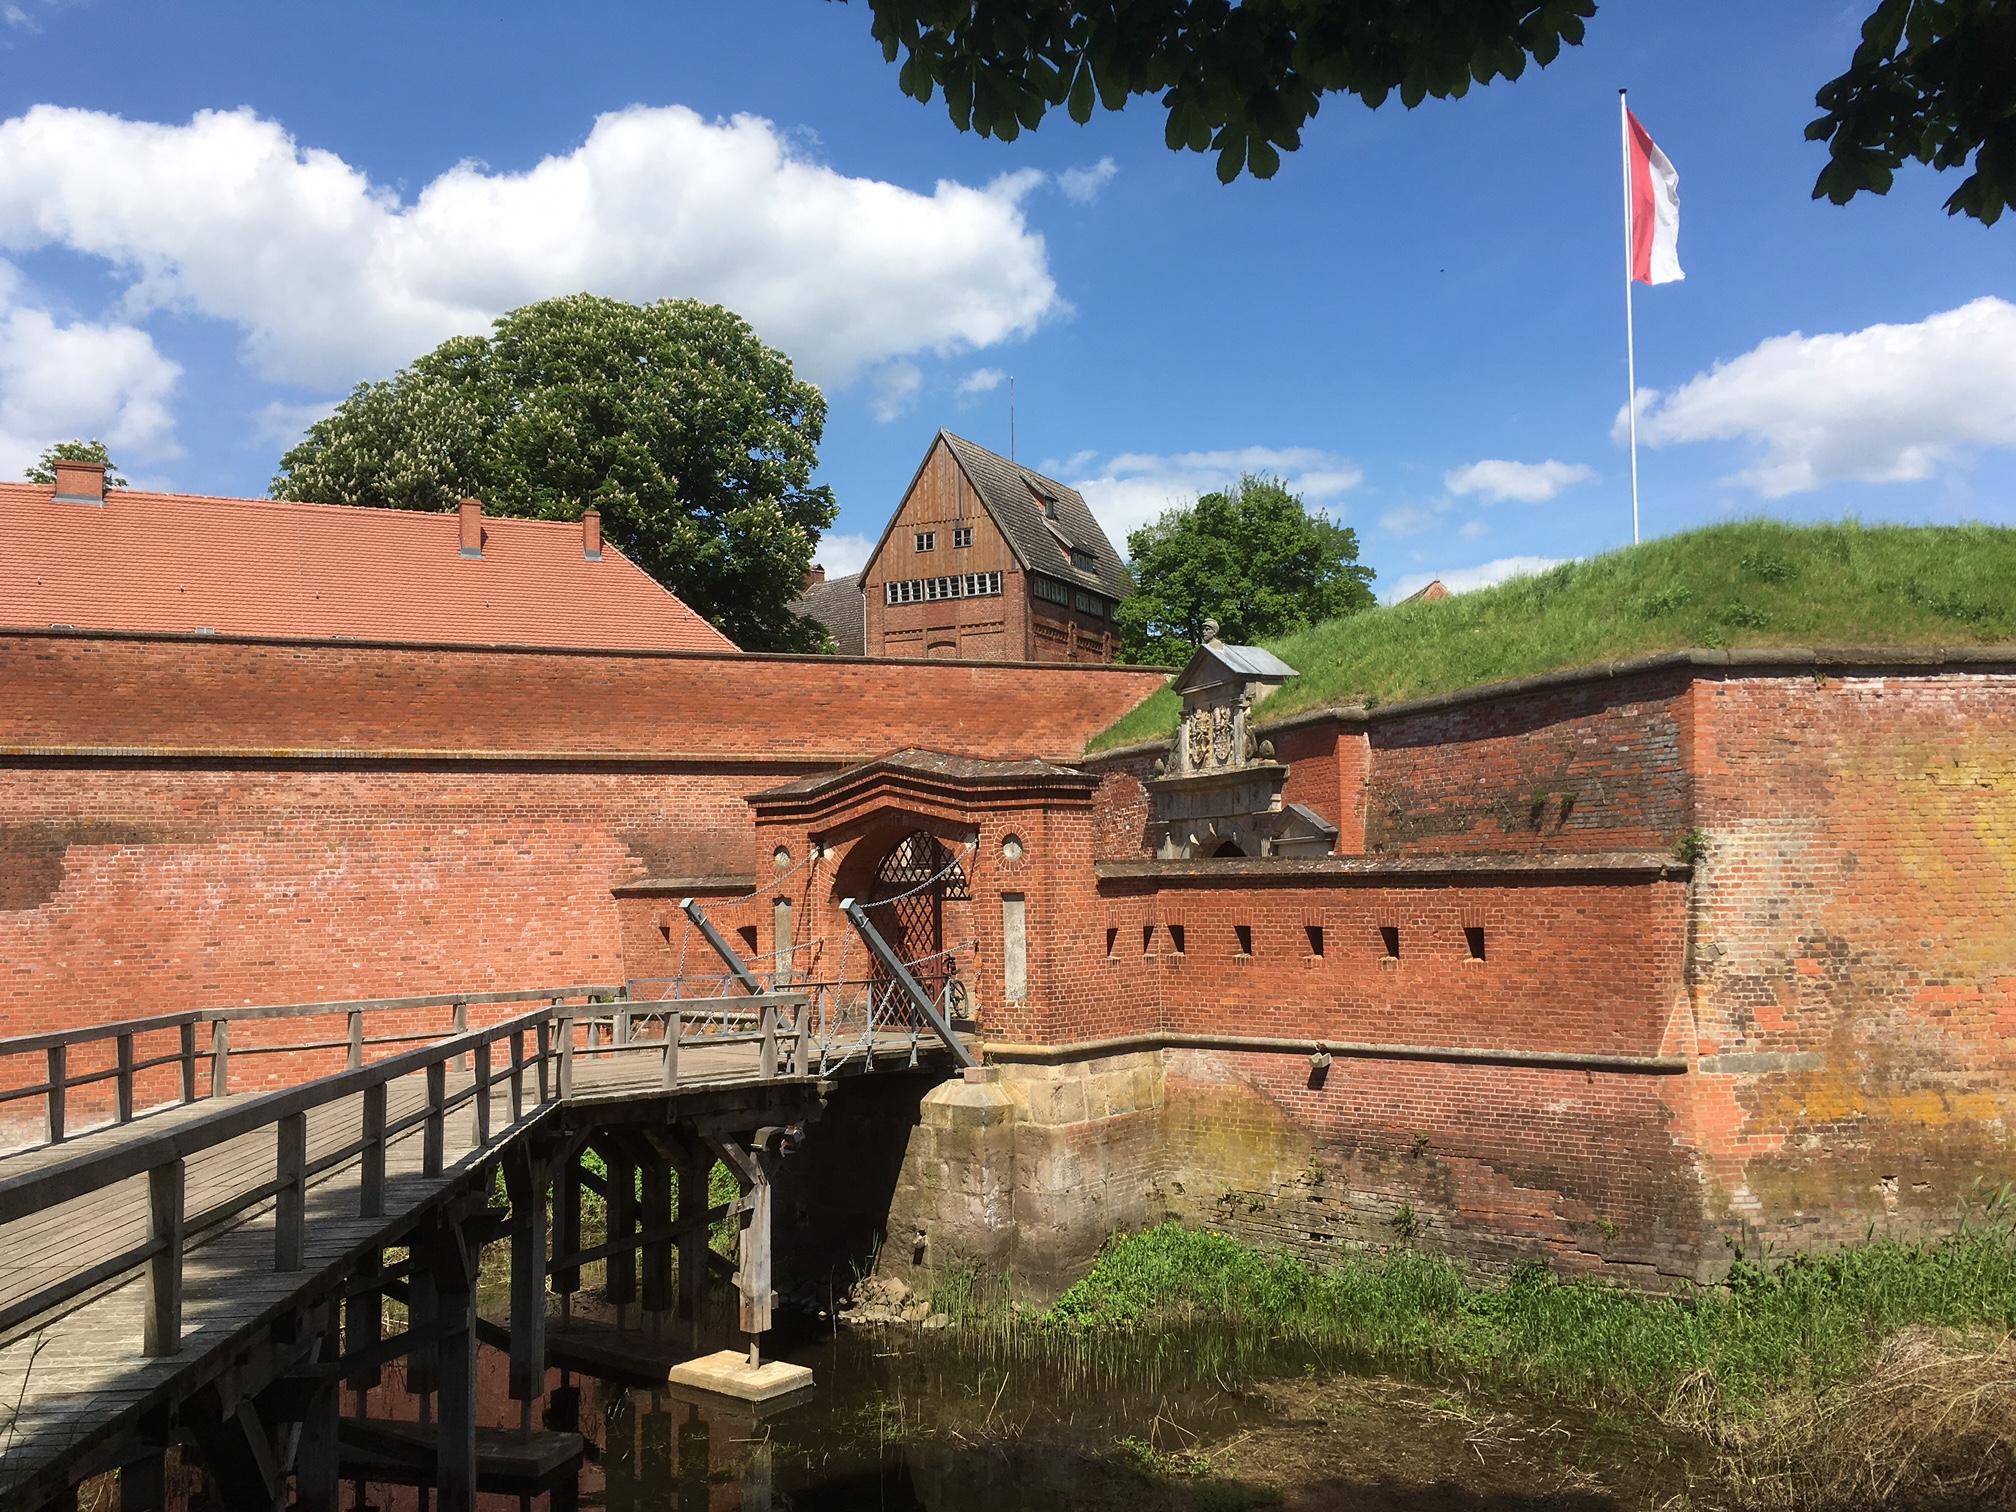 Festung_Dömitz_Zugbrücke_Foto_Museum_Festung_Dömitz,_G__Behncke_(2).JPG